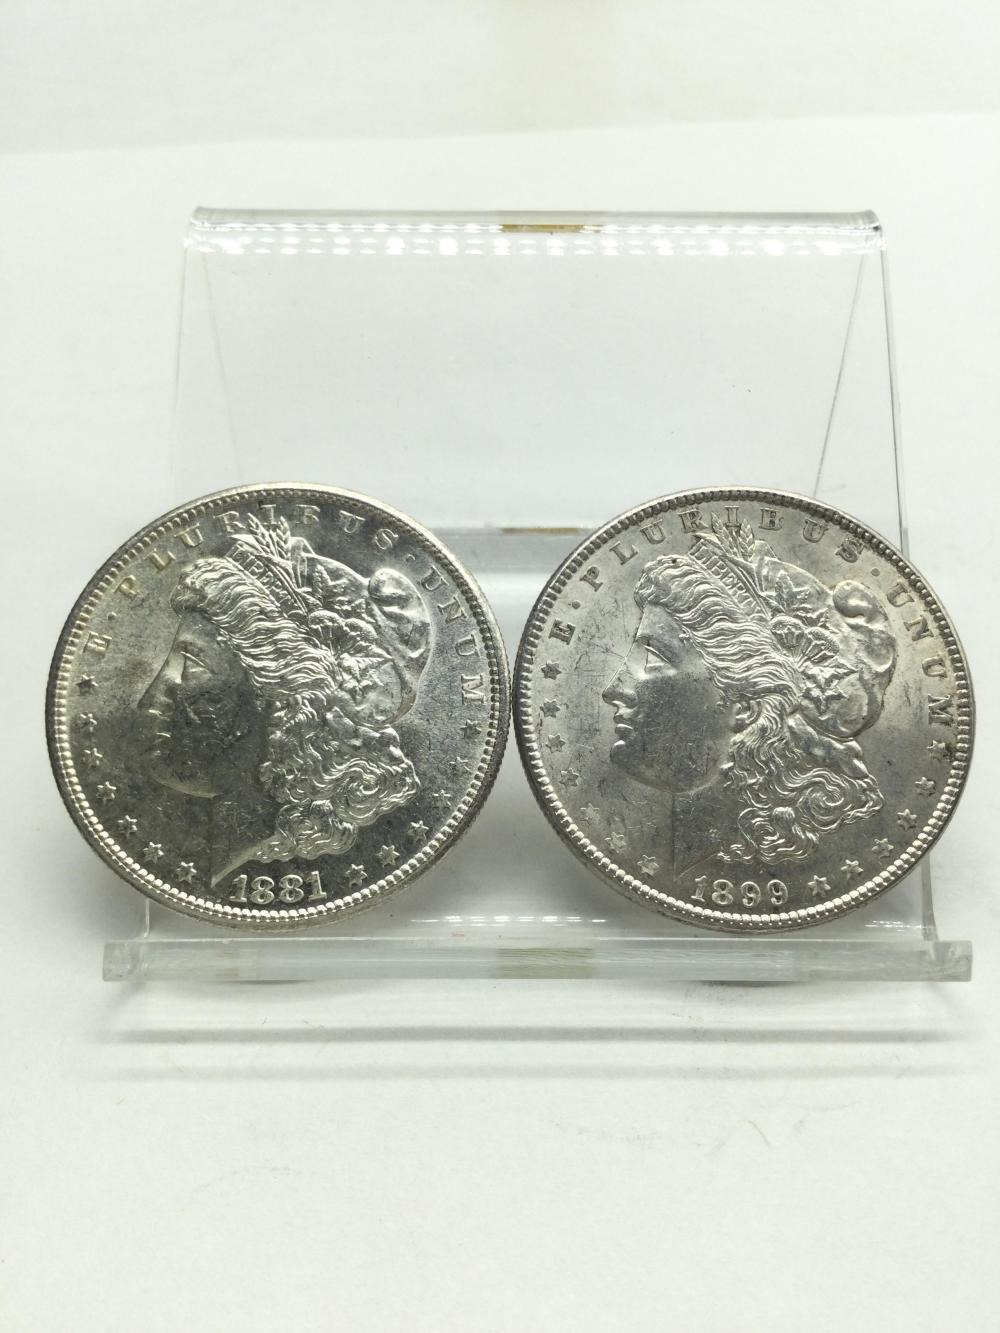 1881 & 1899 Morgan Silver Dollars